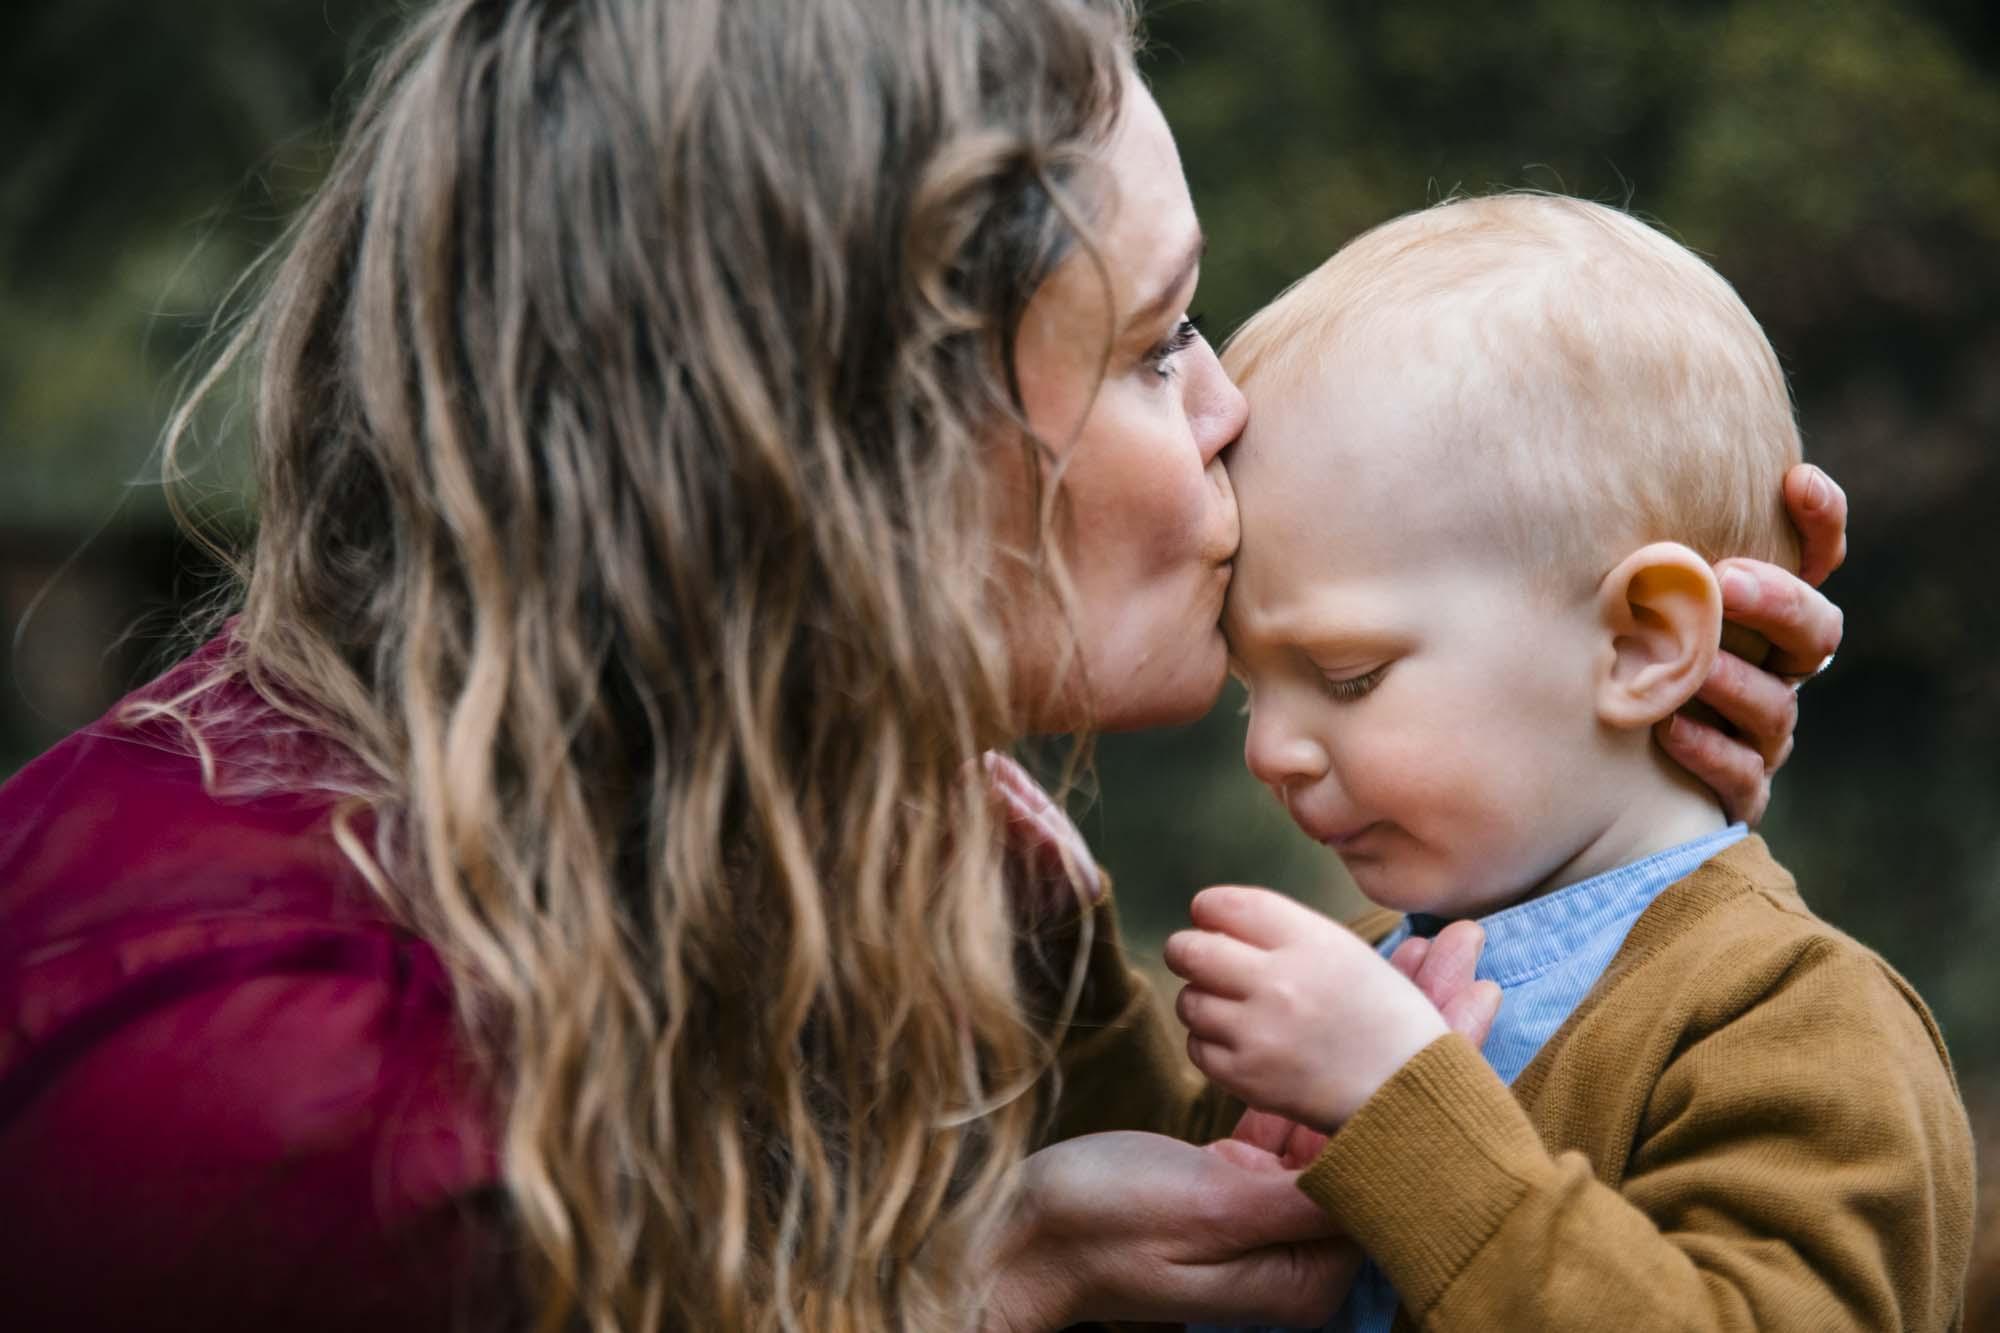 motherhood-henriette-william-cocio